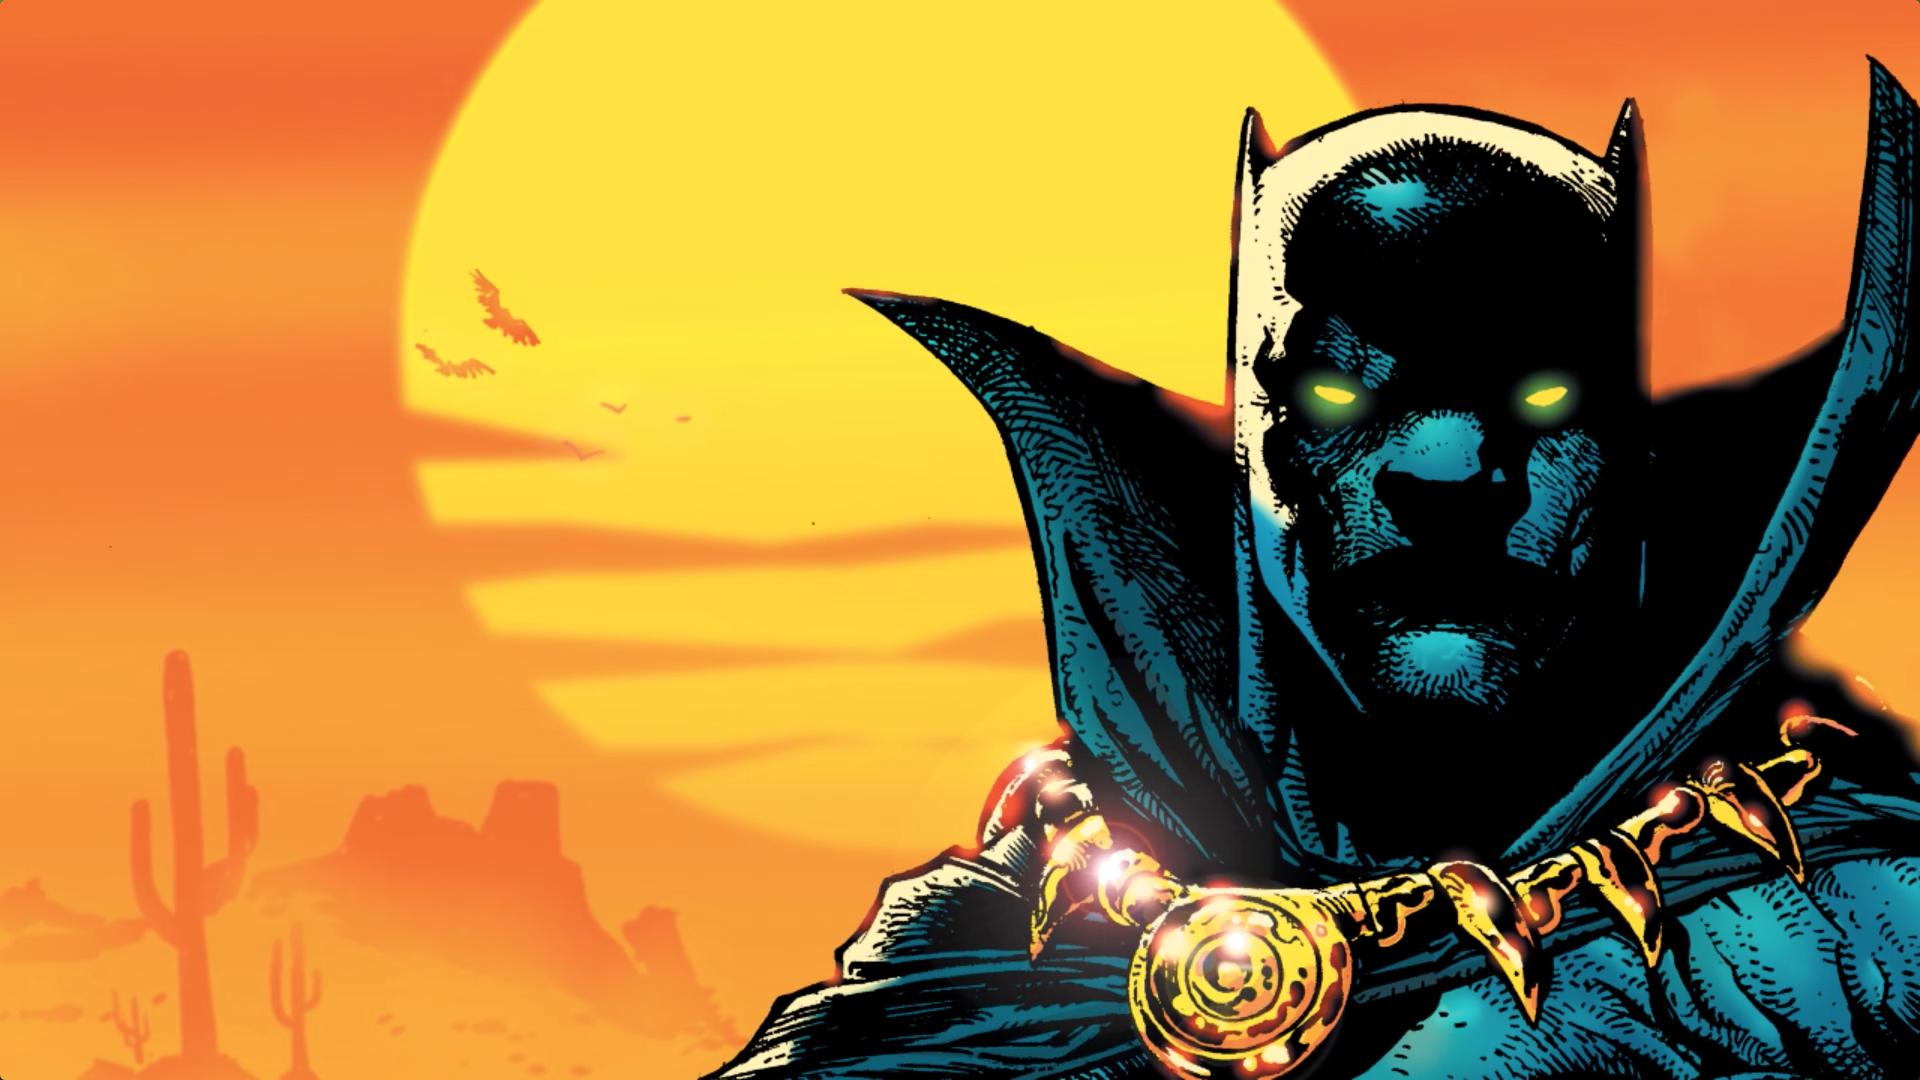 Pantera Negra - Héroes en un minuto